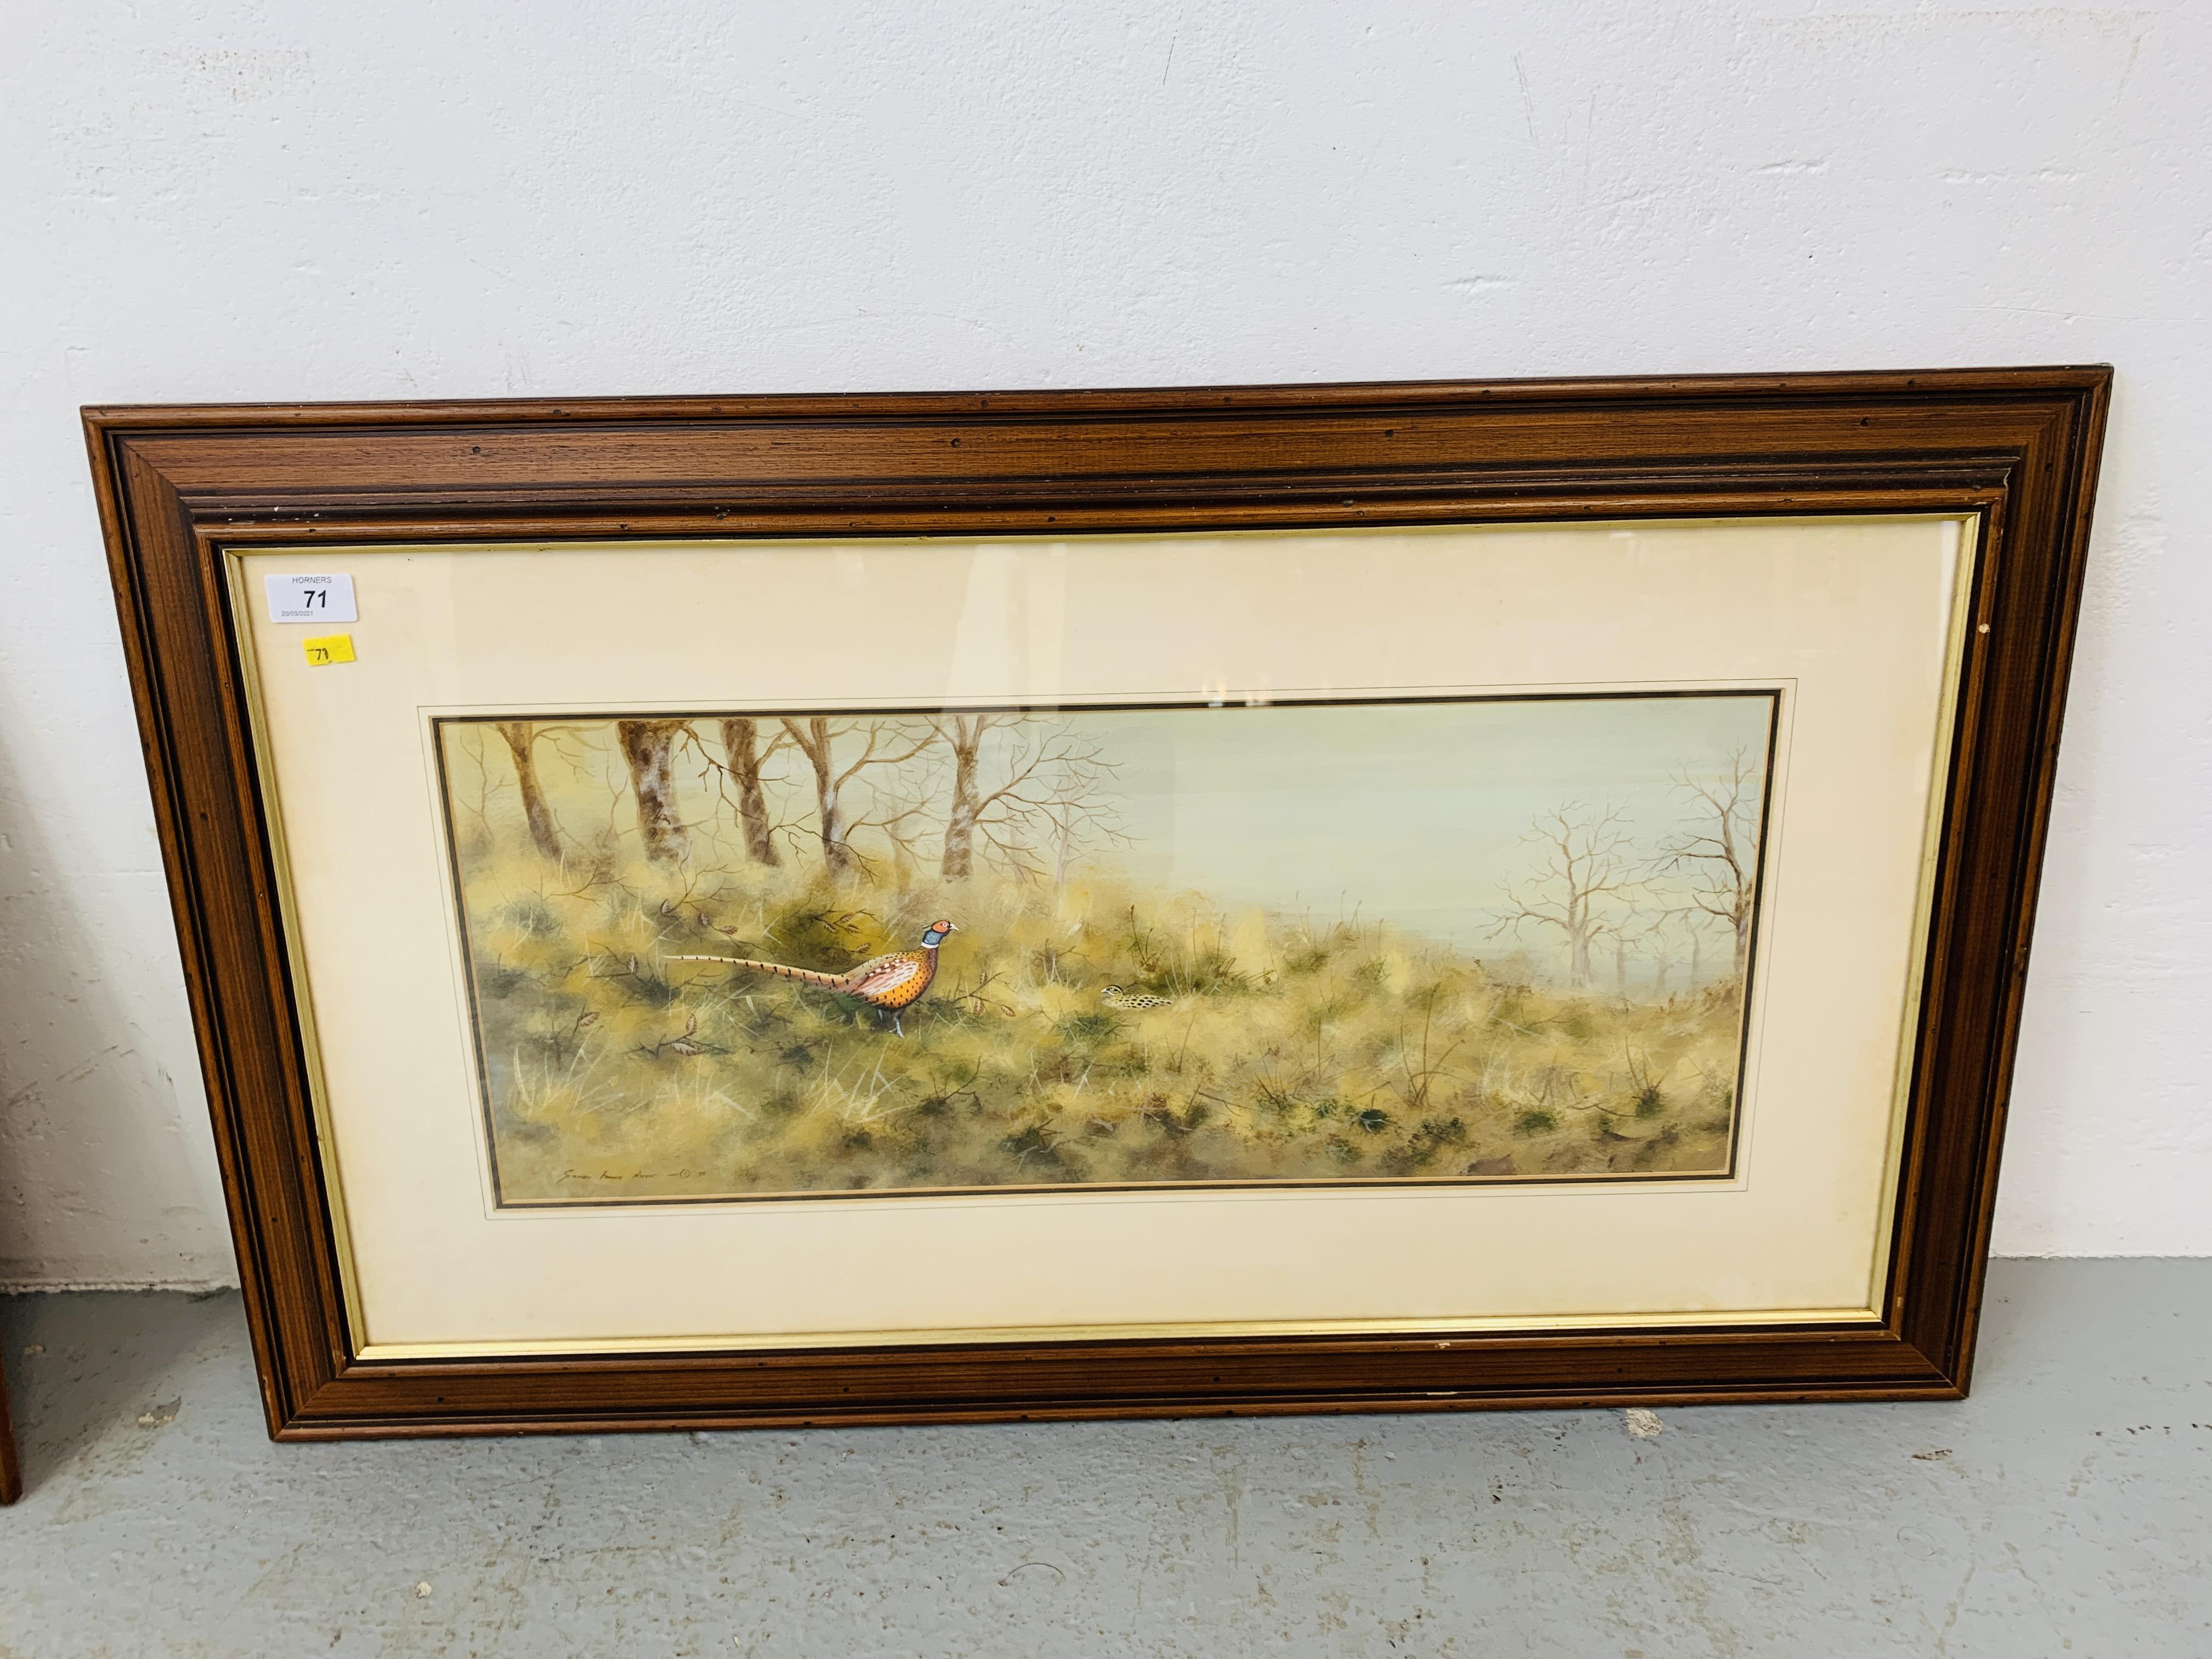 "TWO FRAMED STEPHEN FRANCIS ALLEN WATERCOLOURS ""HERON & GEESE IN WETLAND SCENE"" 25 X 72. - Image 2 of 3"